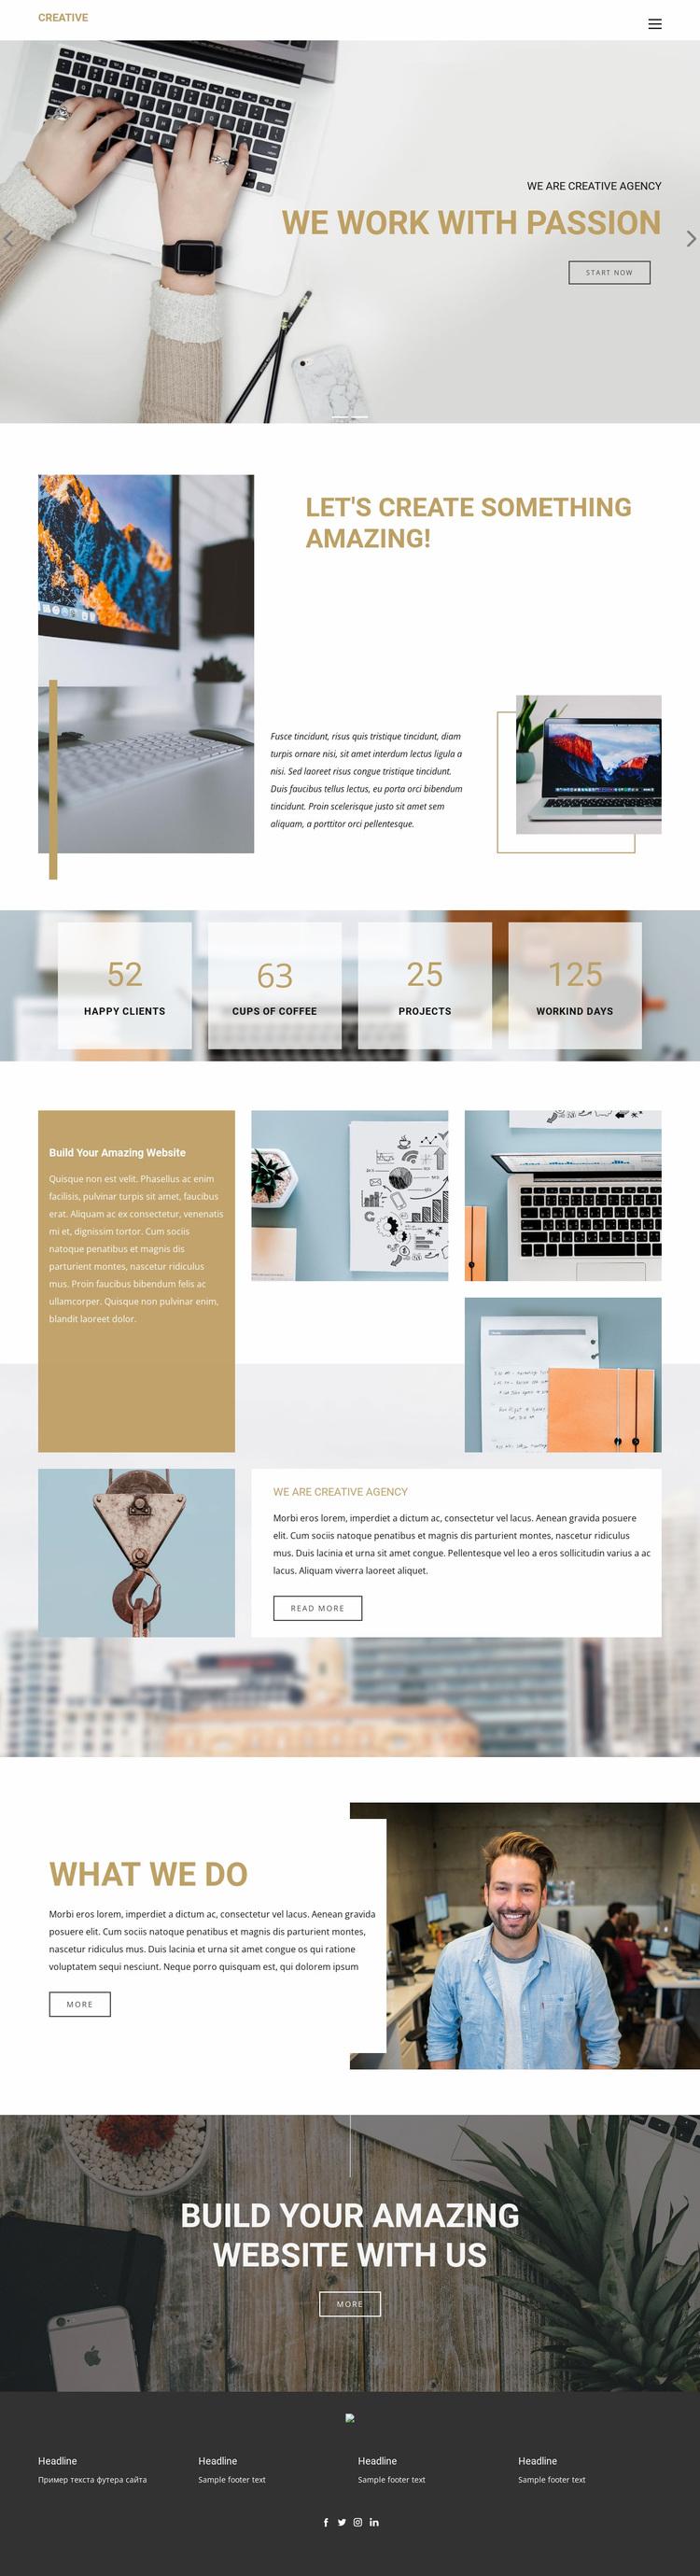 Exceptional creative designs Website Design